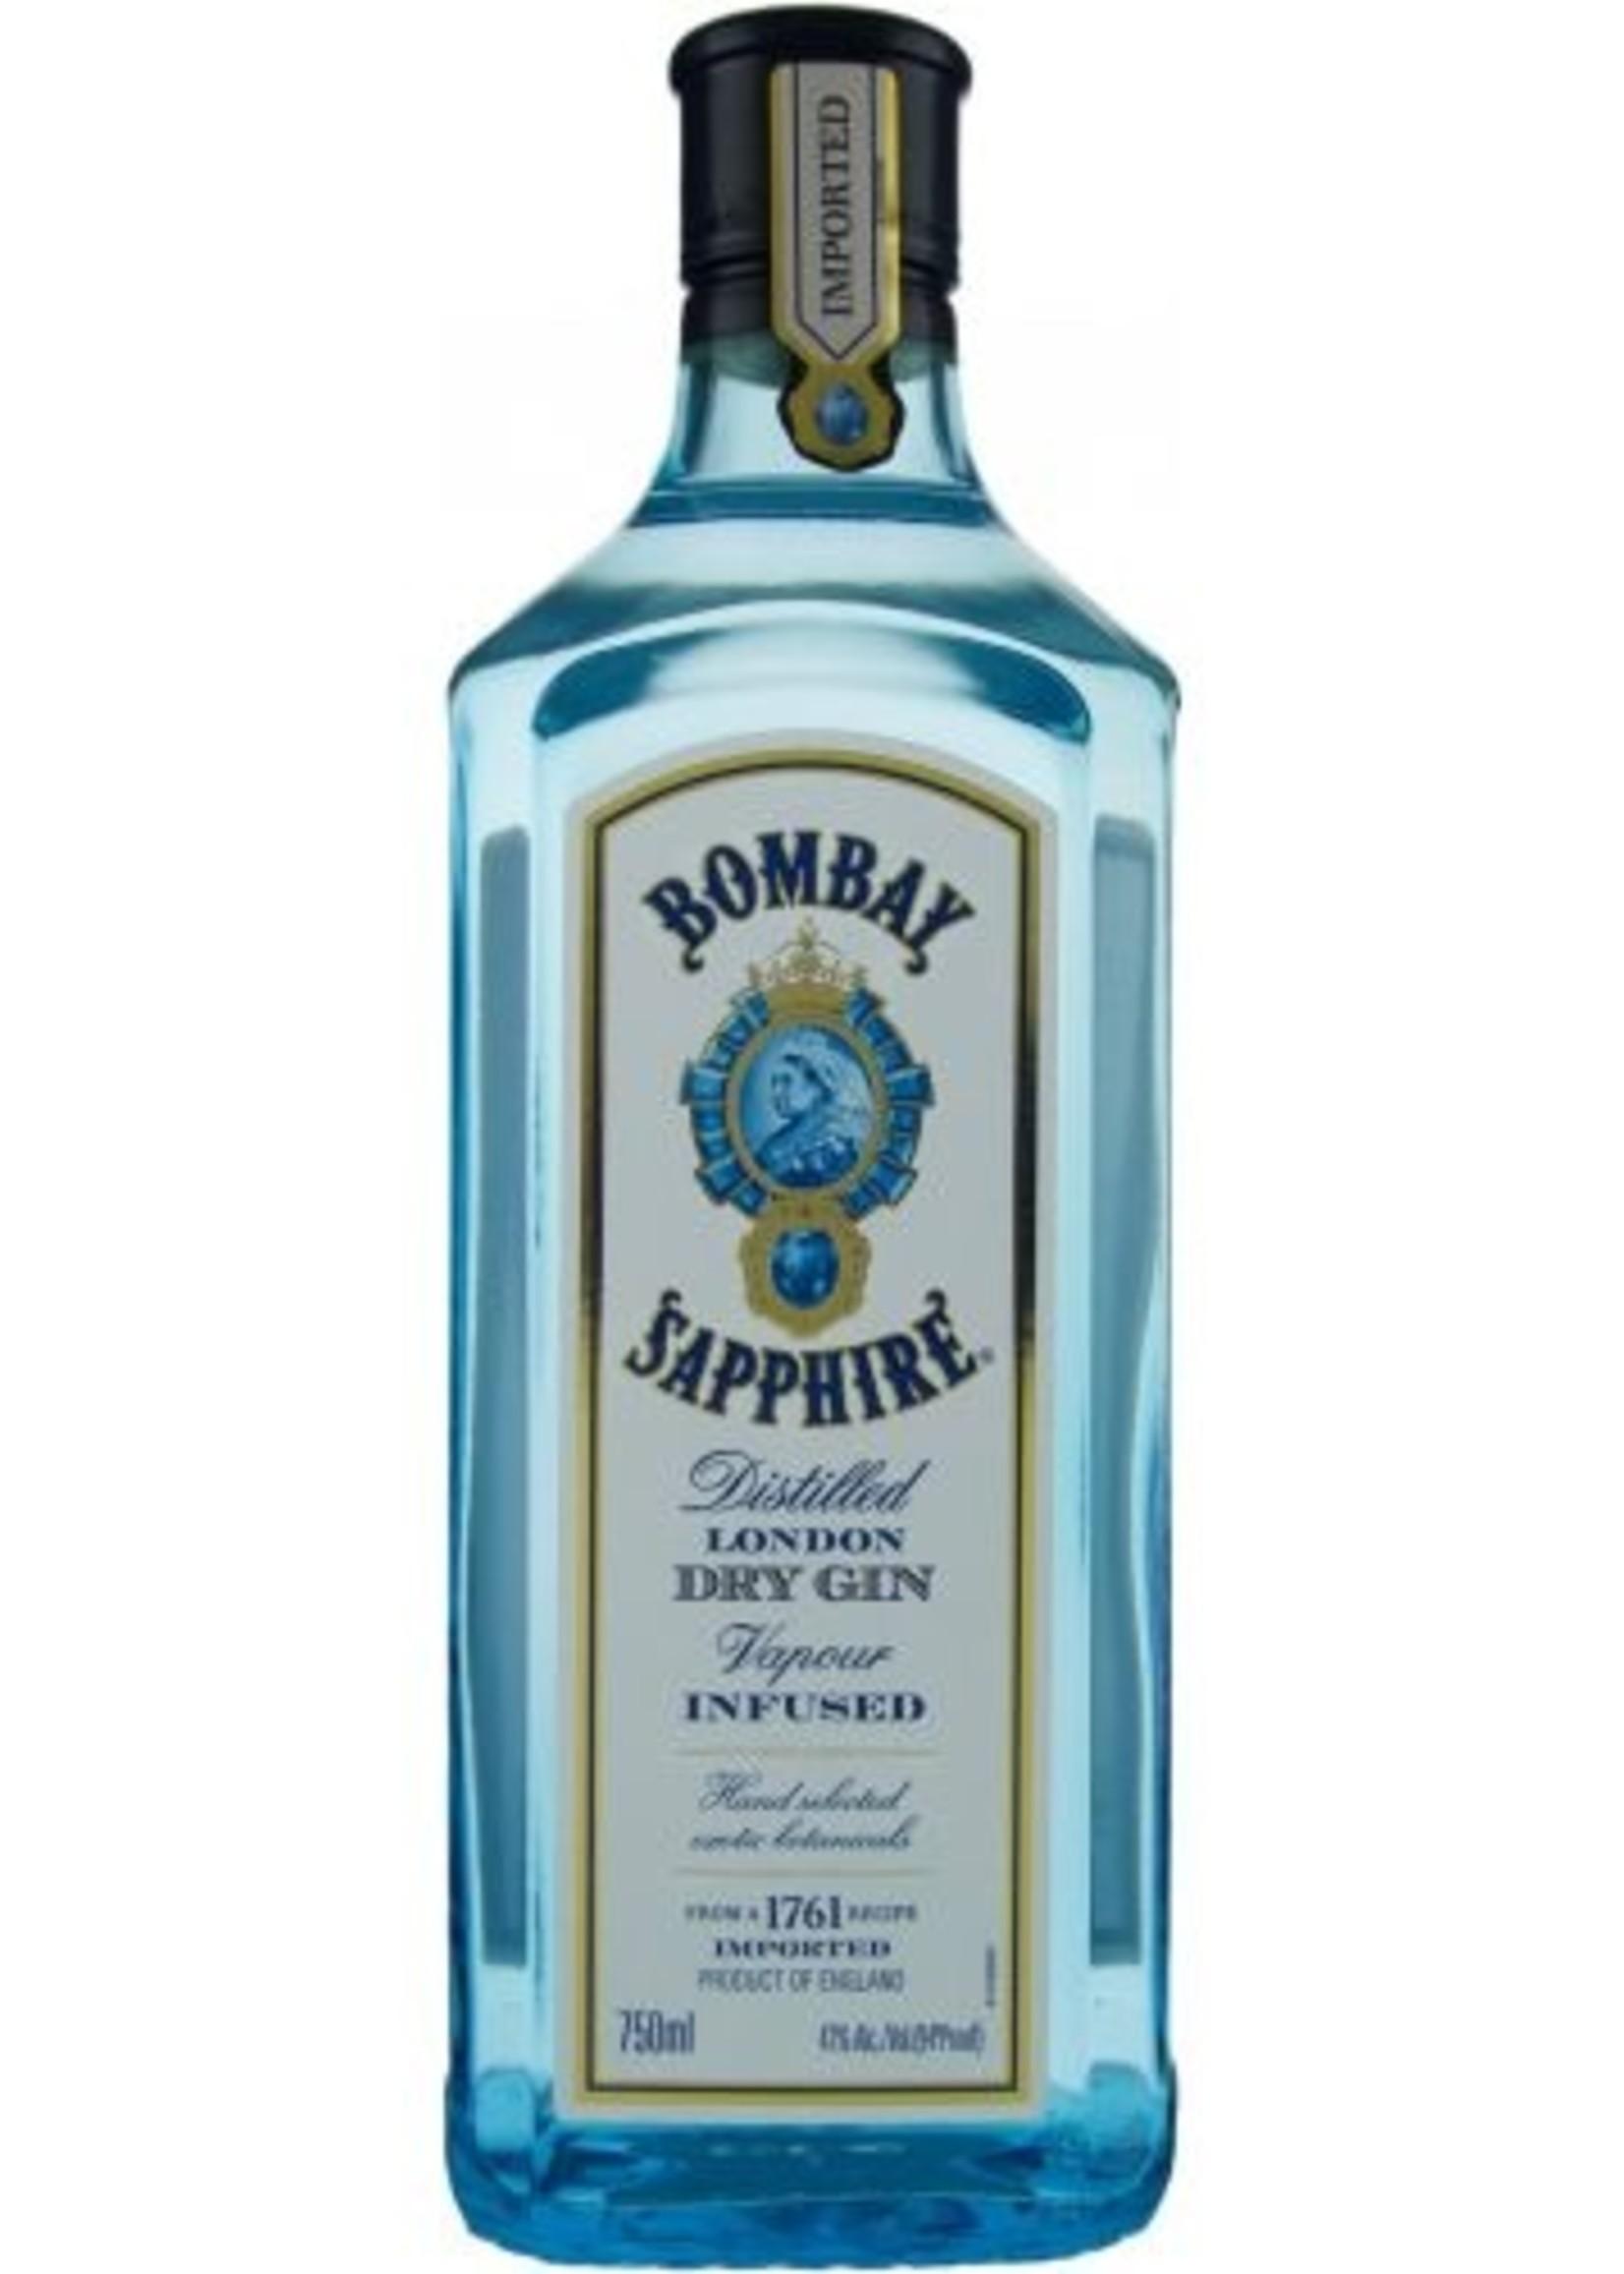 Bombay Sapphire LTR